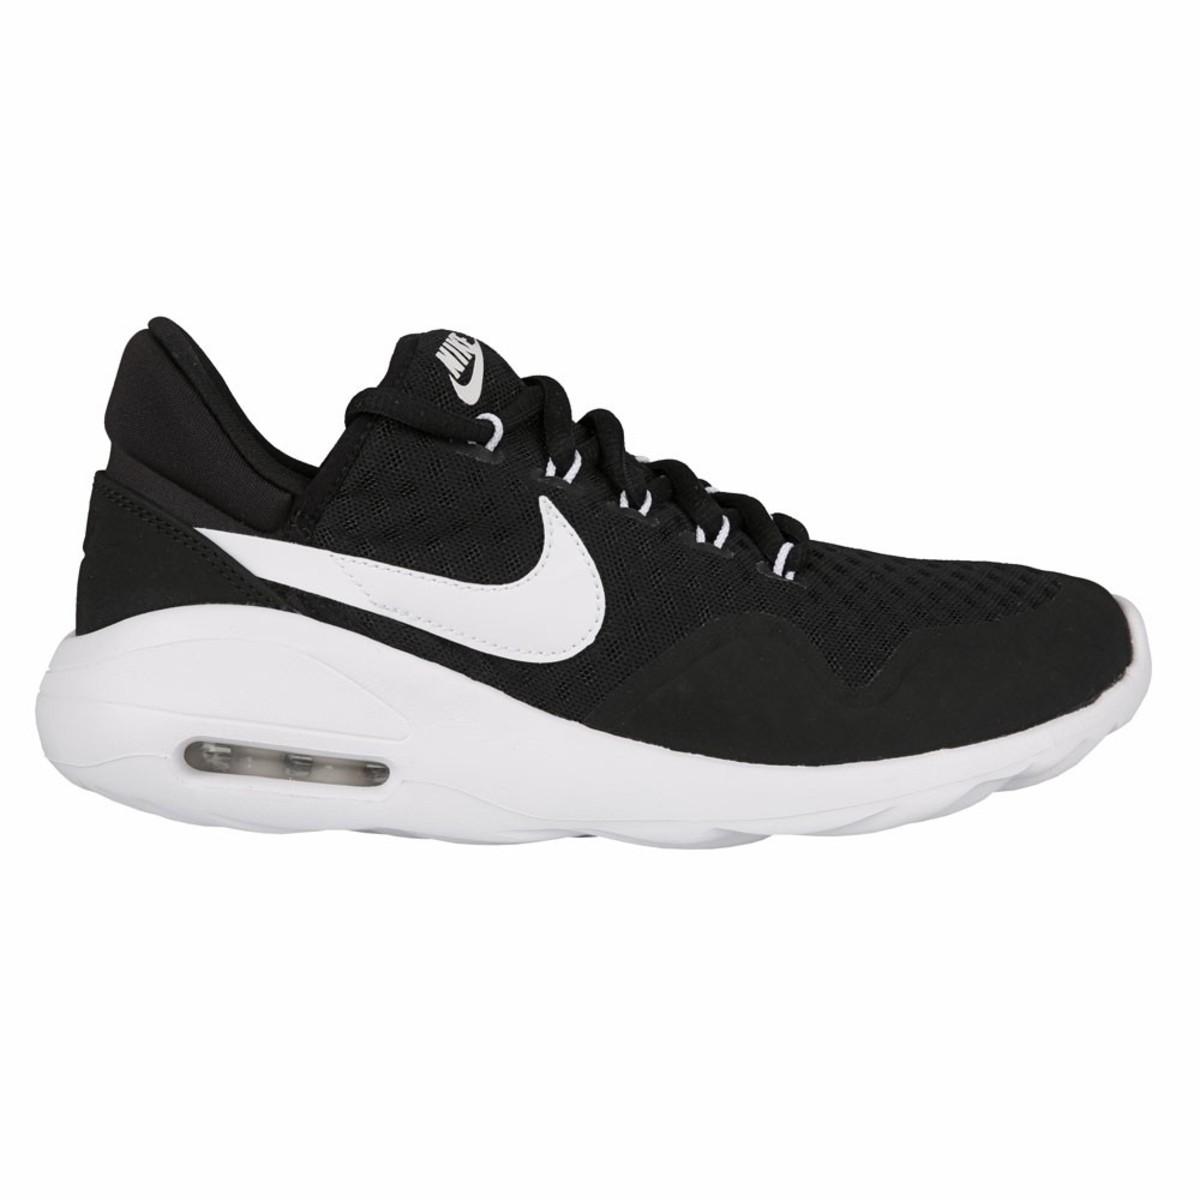 Bild 5 von Nike Air Max Sasha (Damen), Sneaker, schwarz 35,5